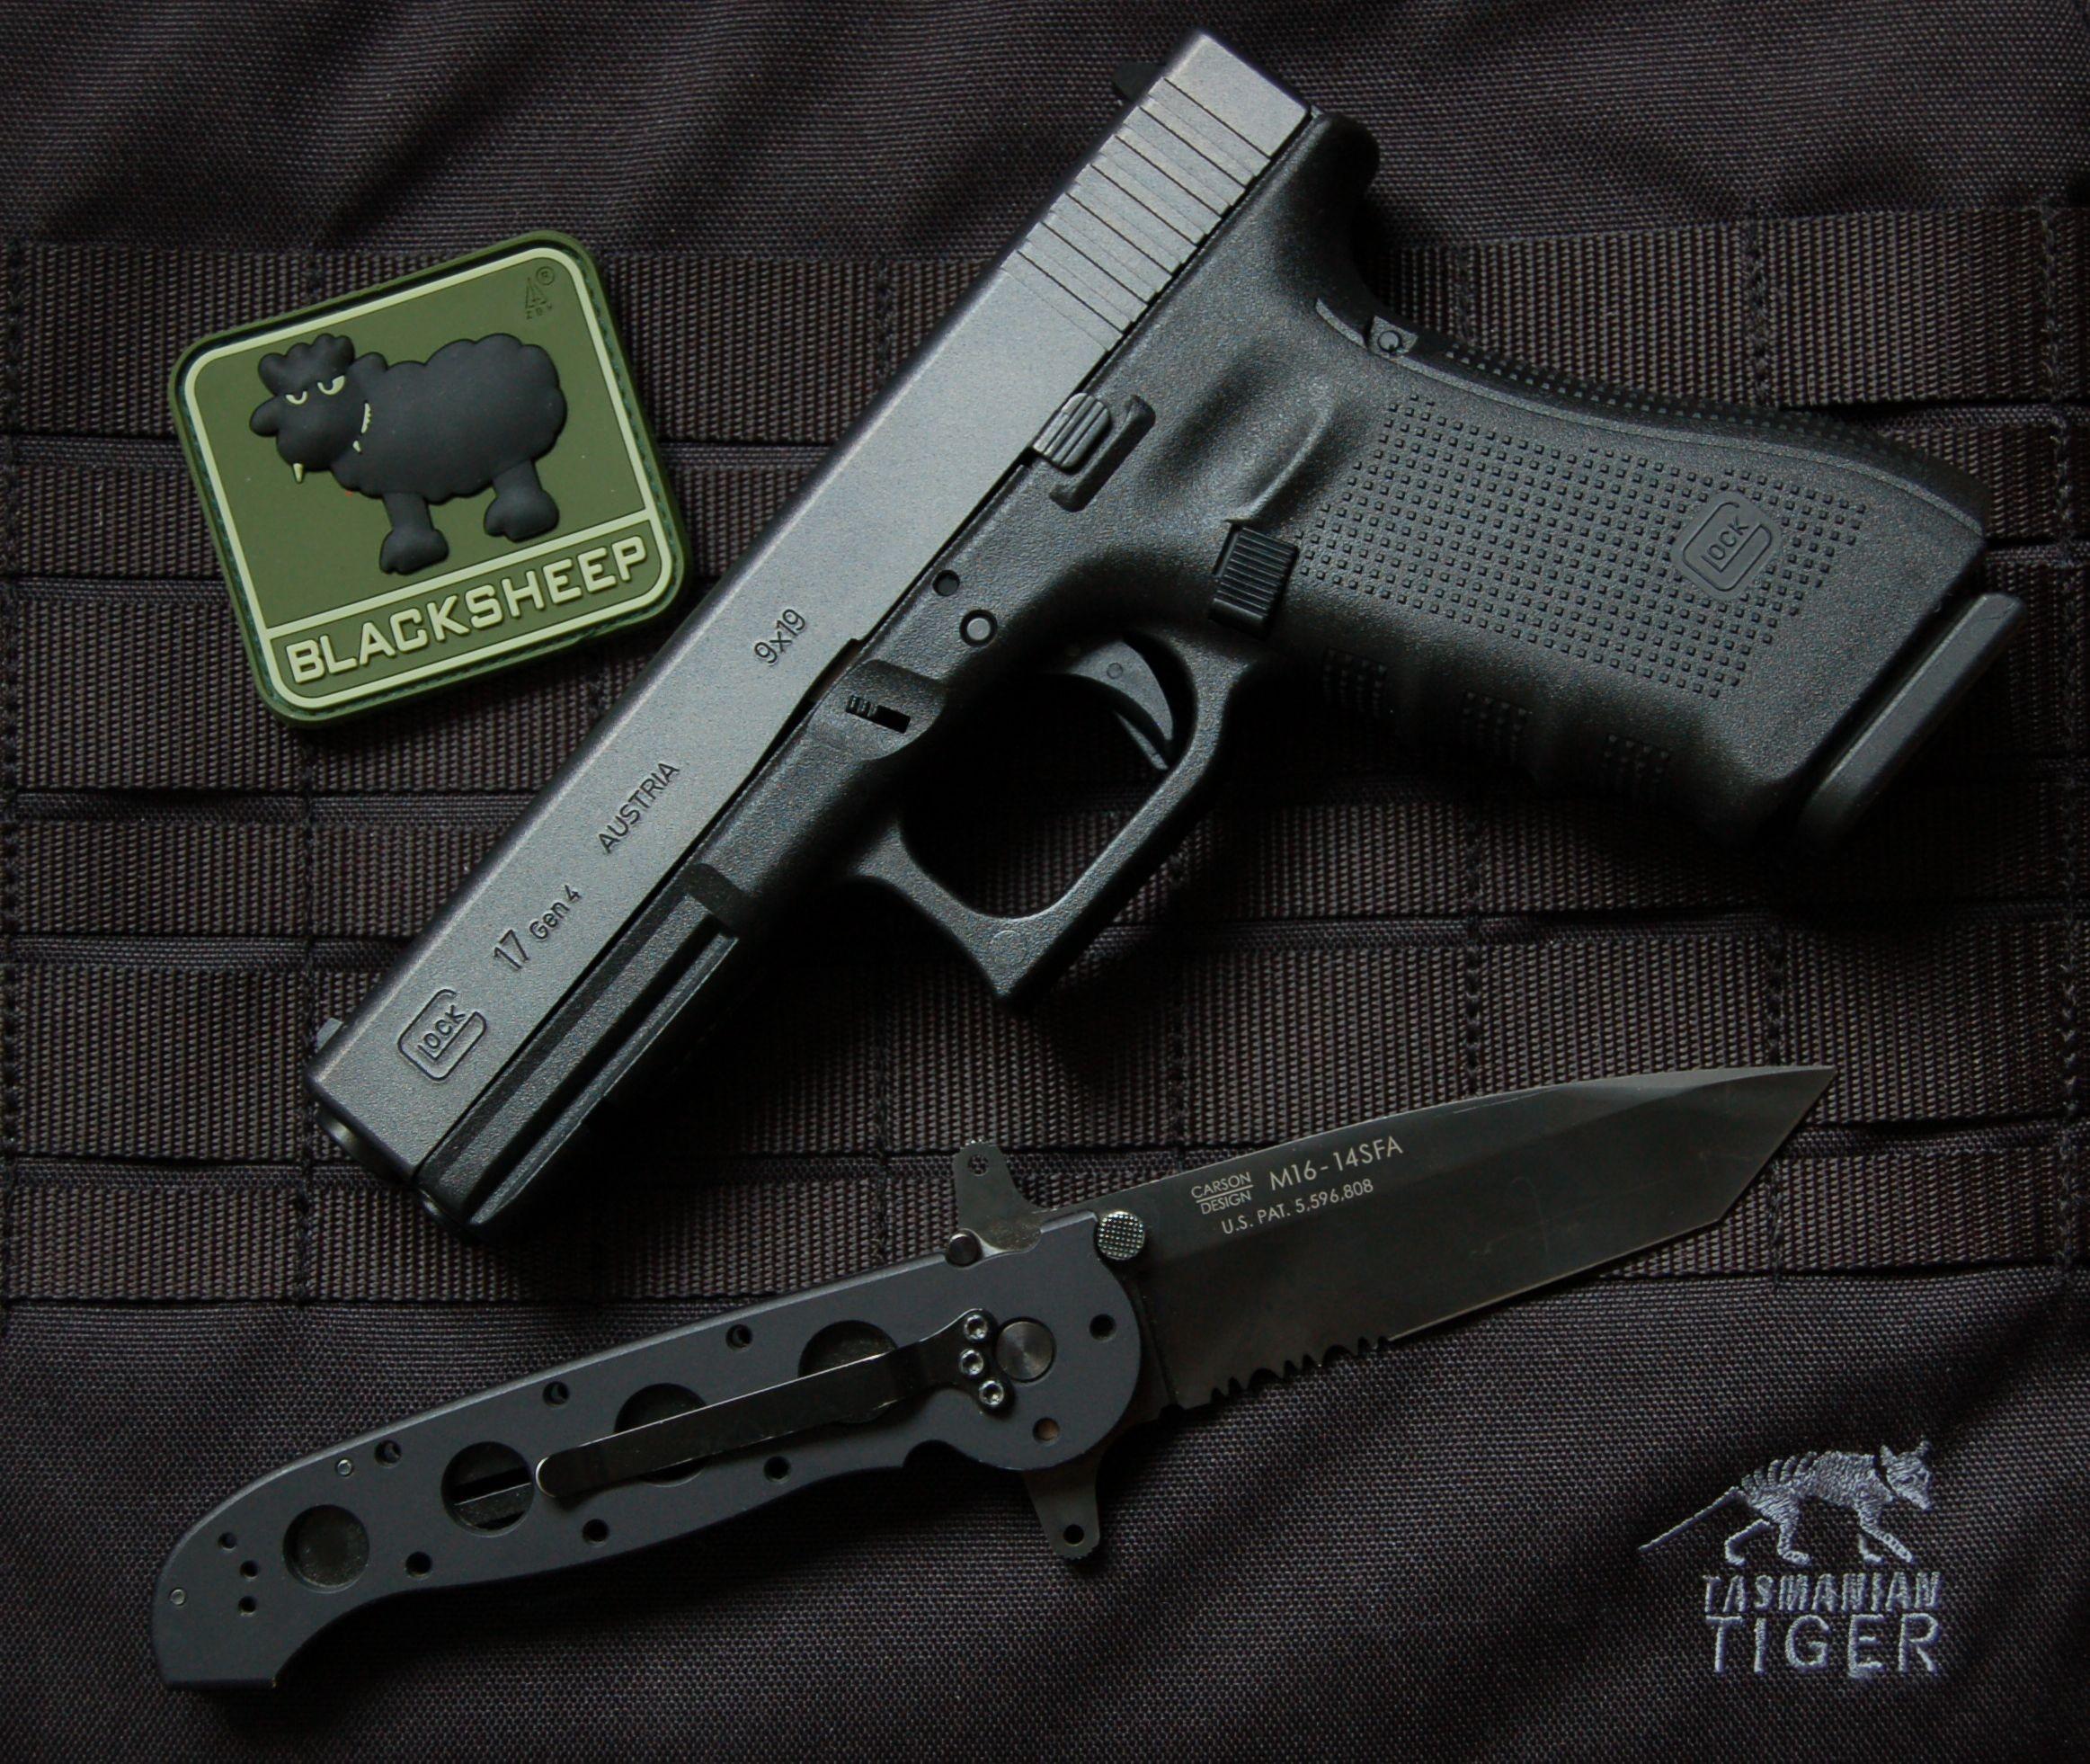 Glock 17 gen 4 wallpaper - Glock wallpaper ...